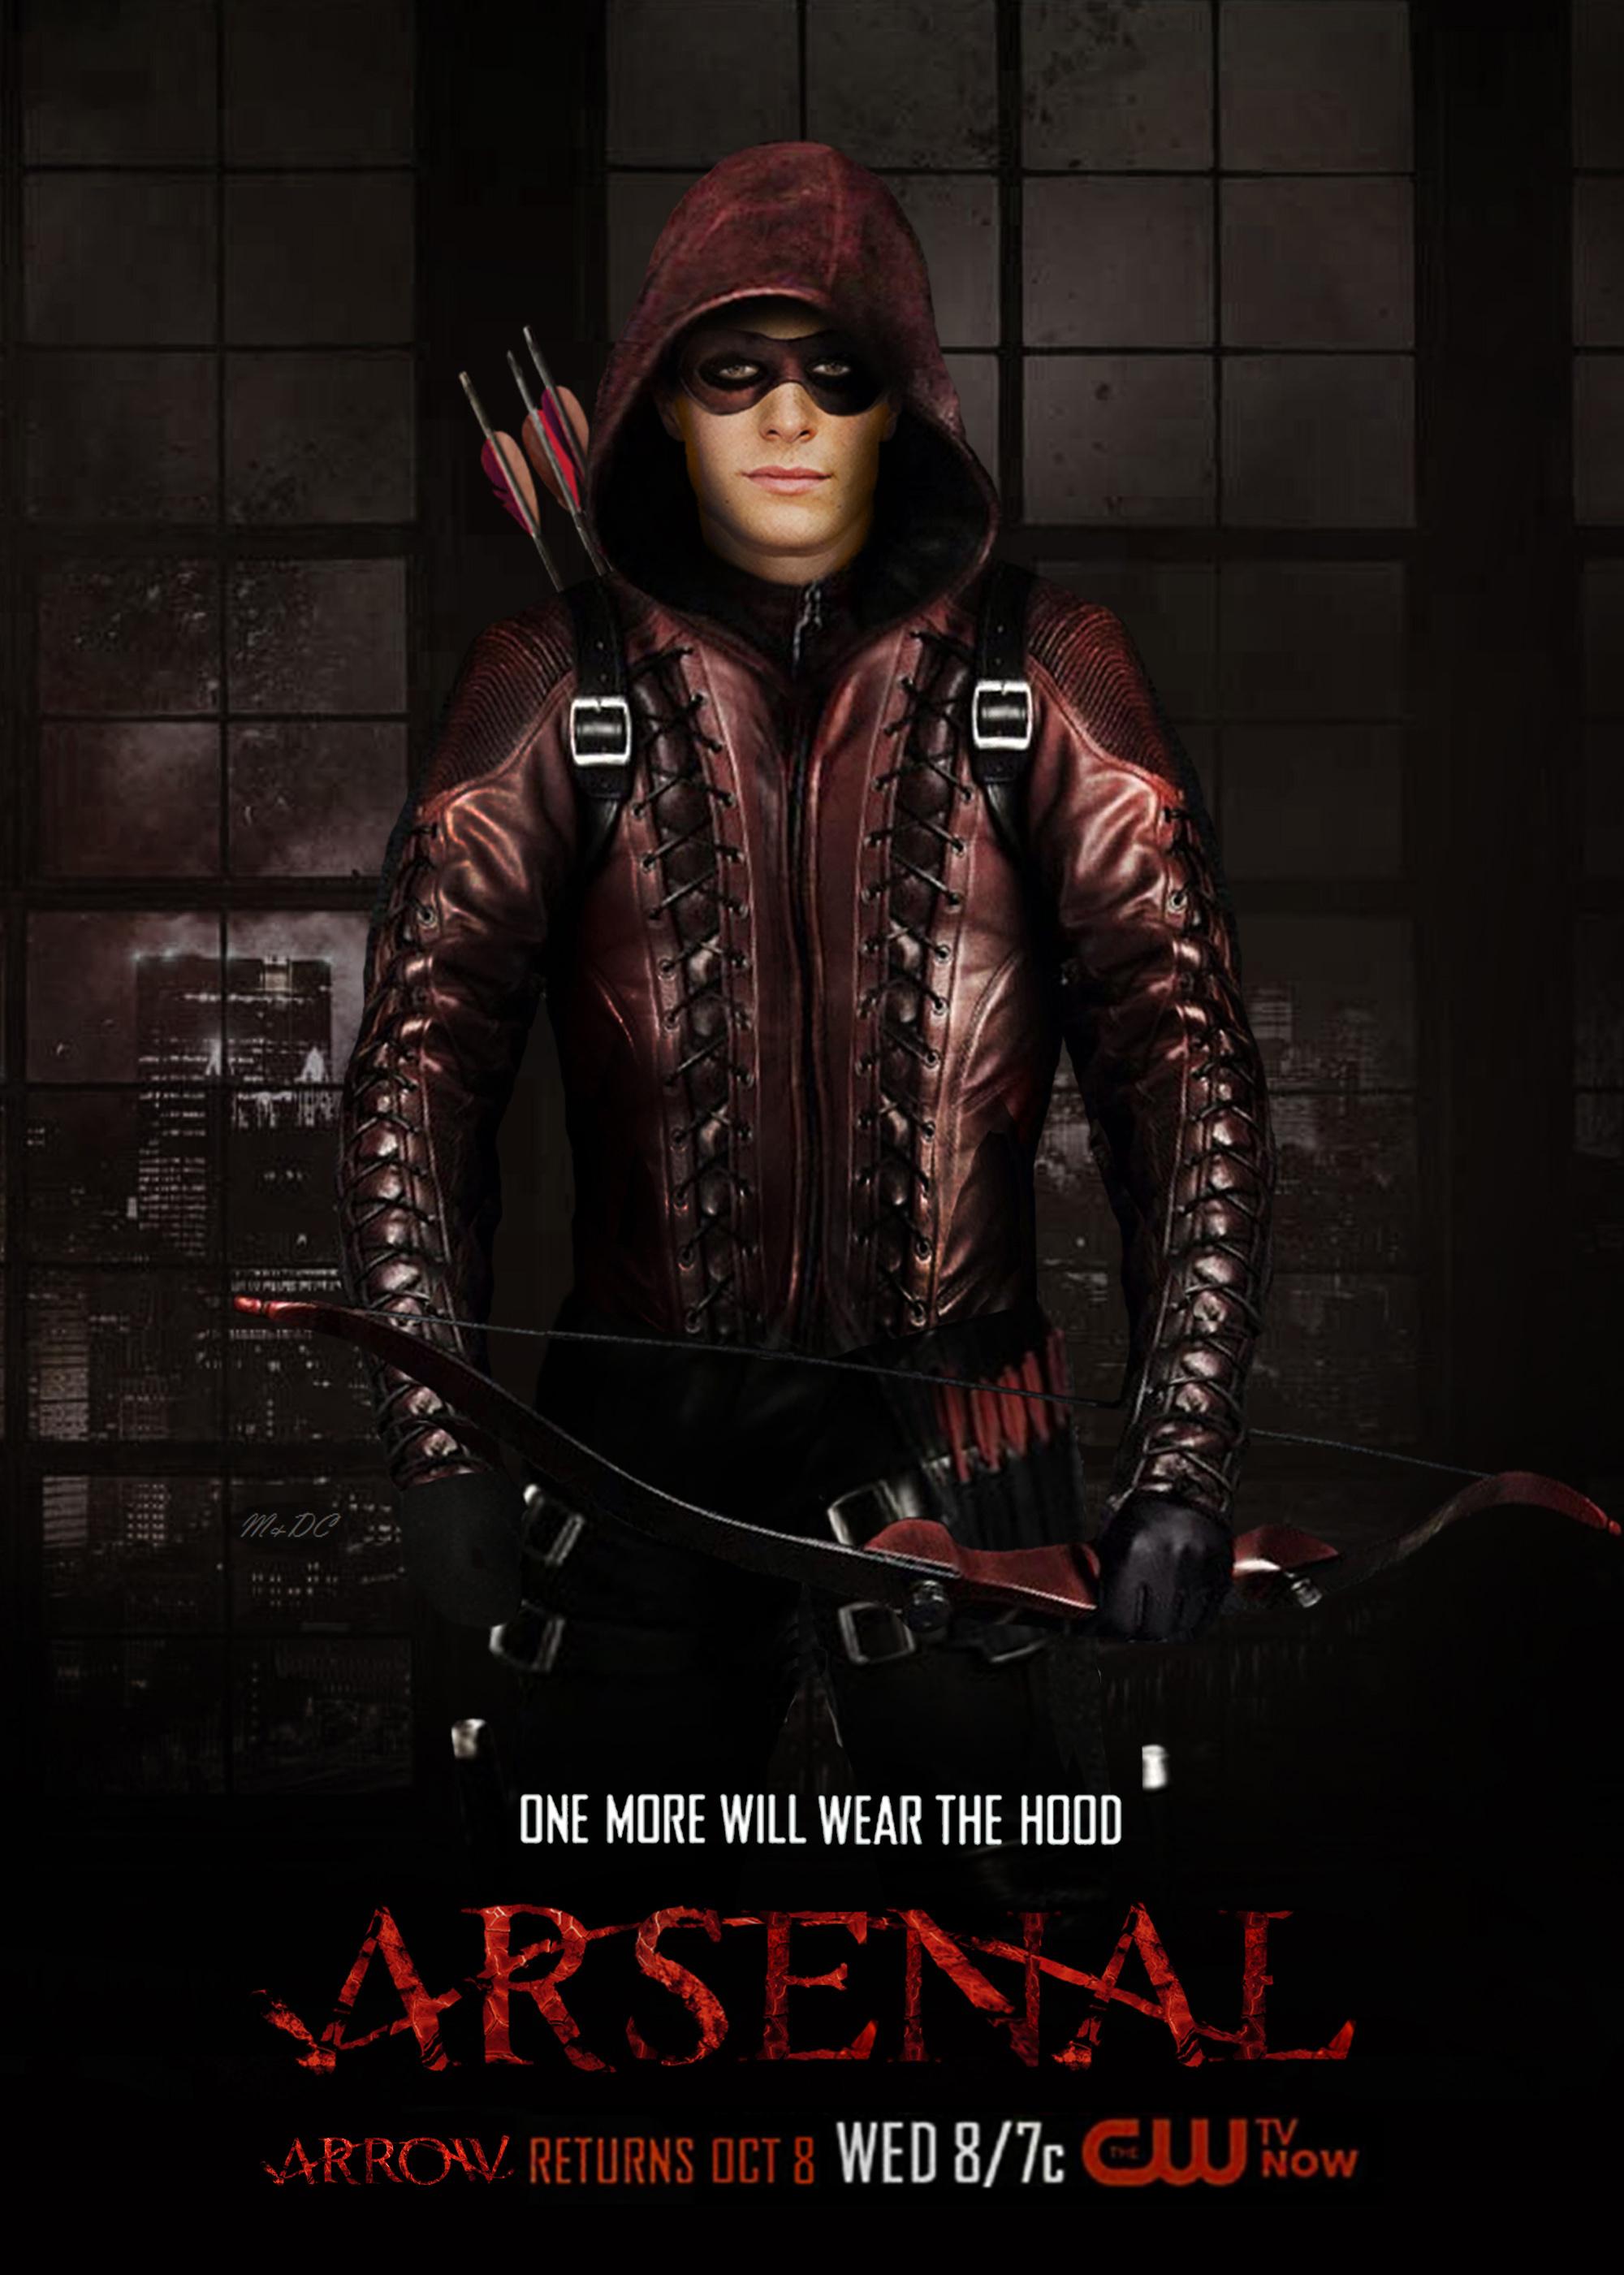 Arrow Season Promo by fmirza on DeviantArt